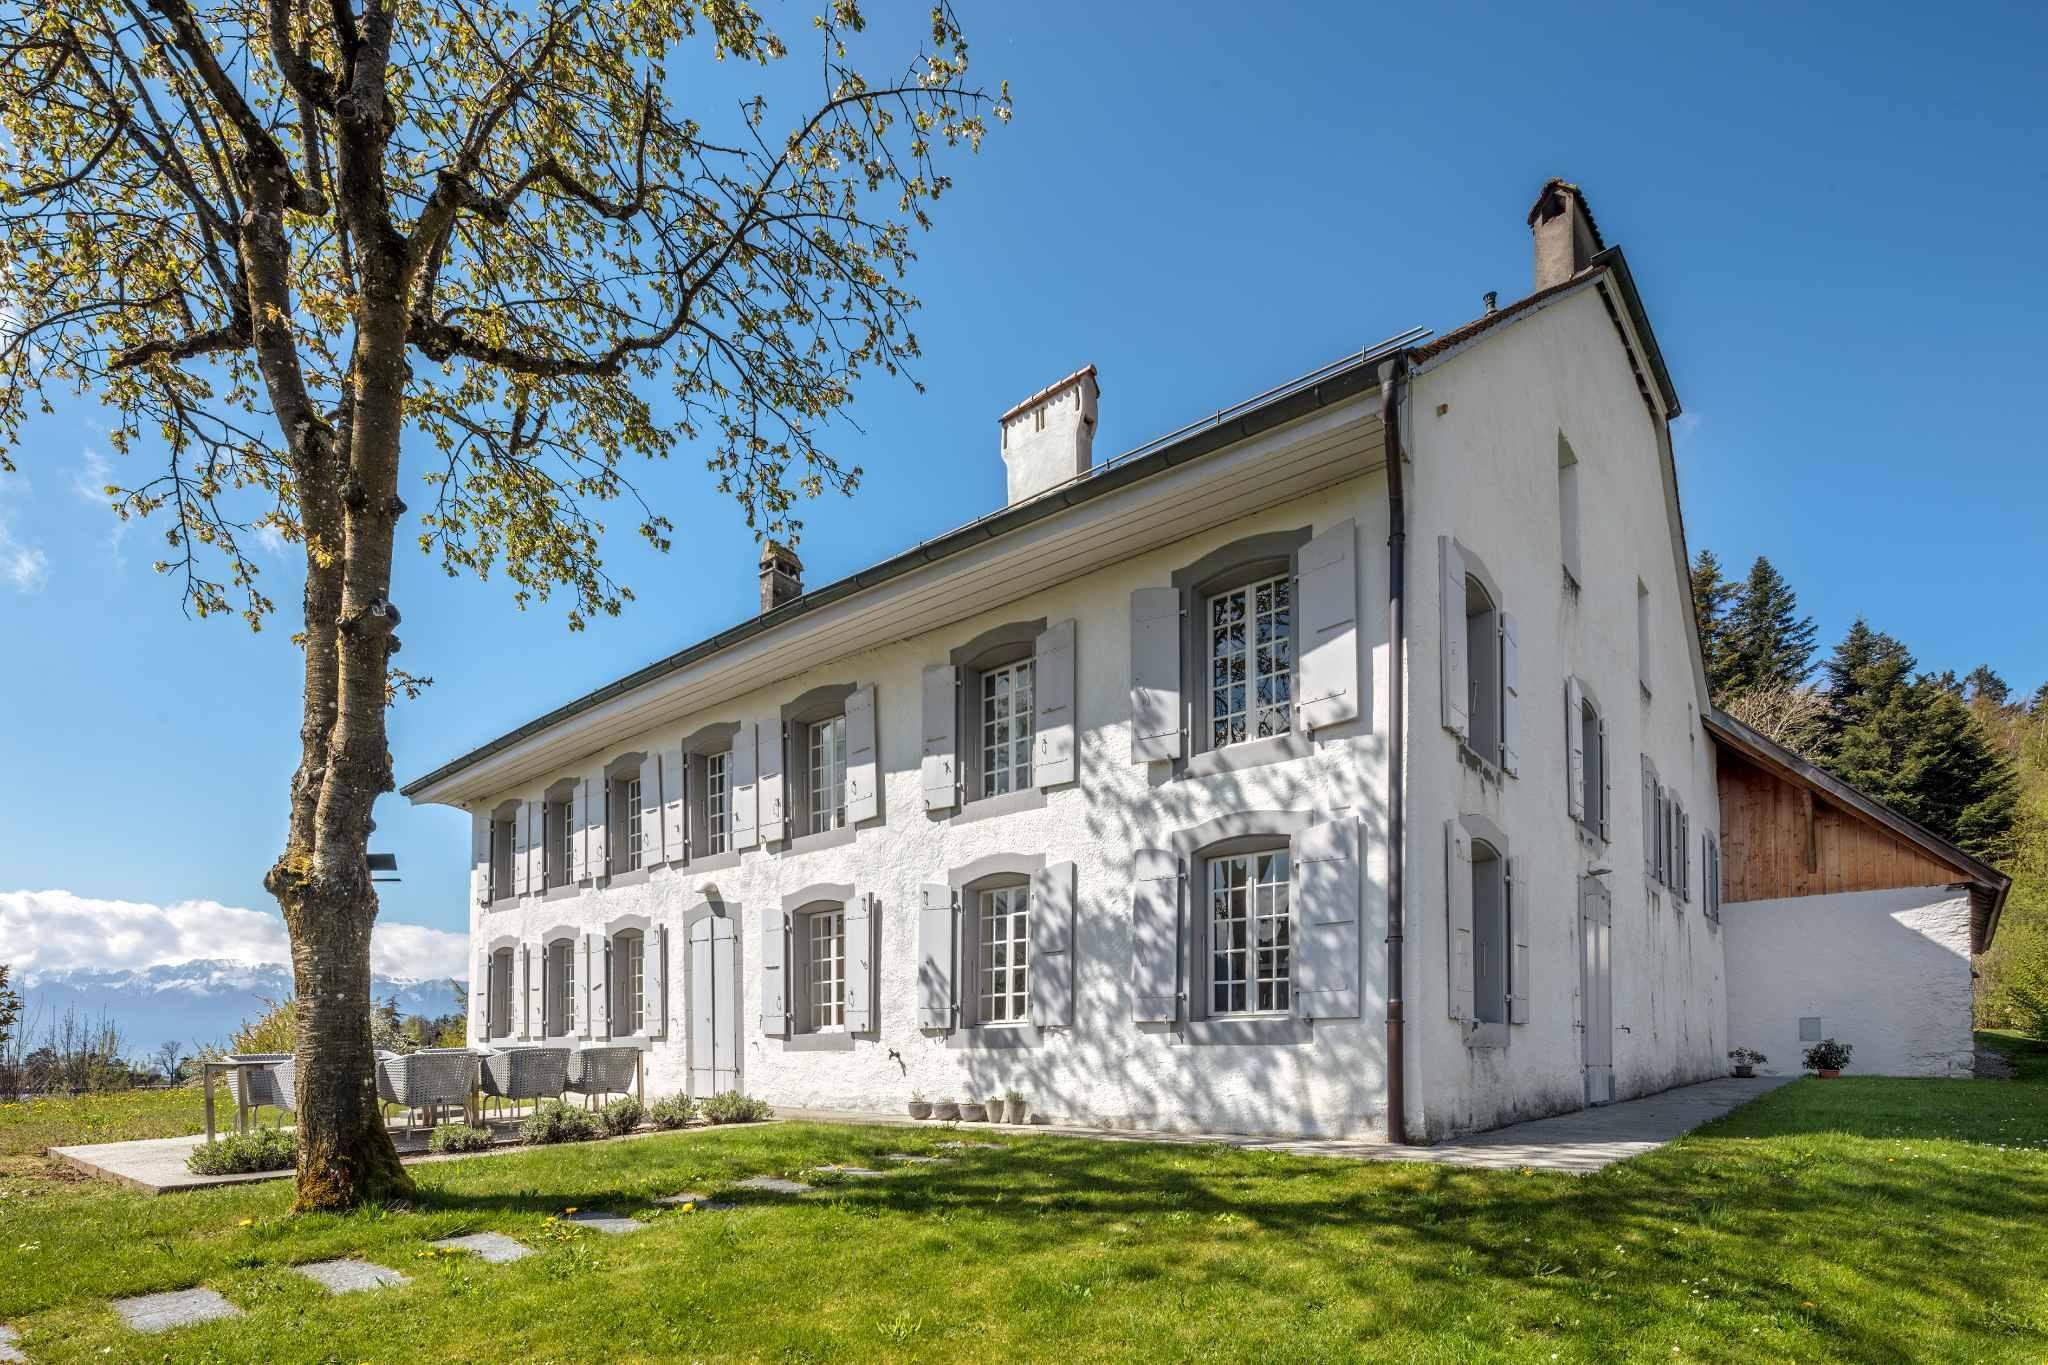 The Maison Blanche